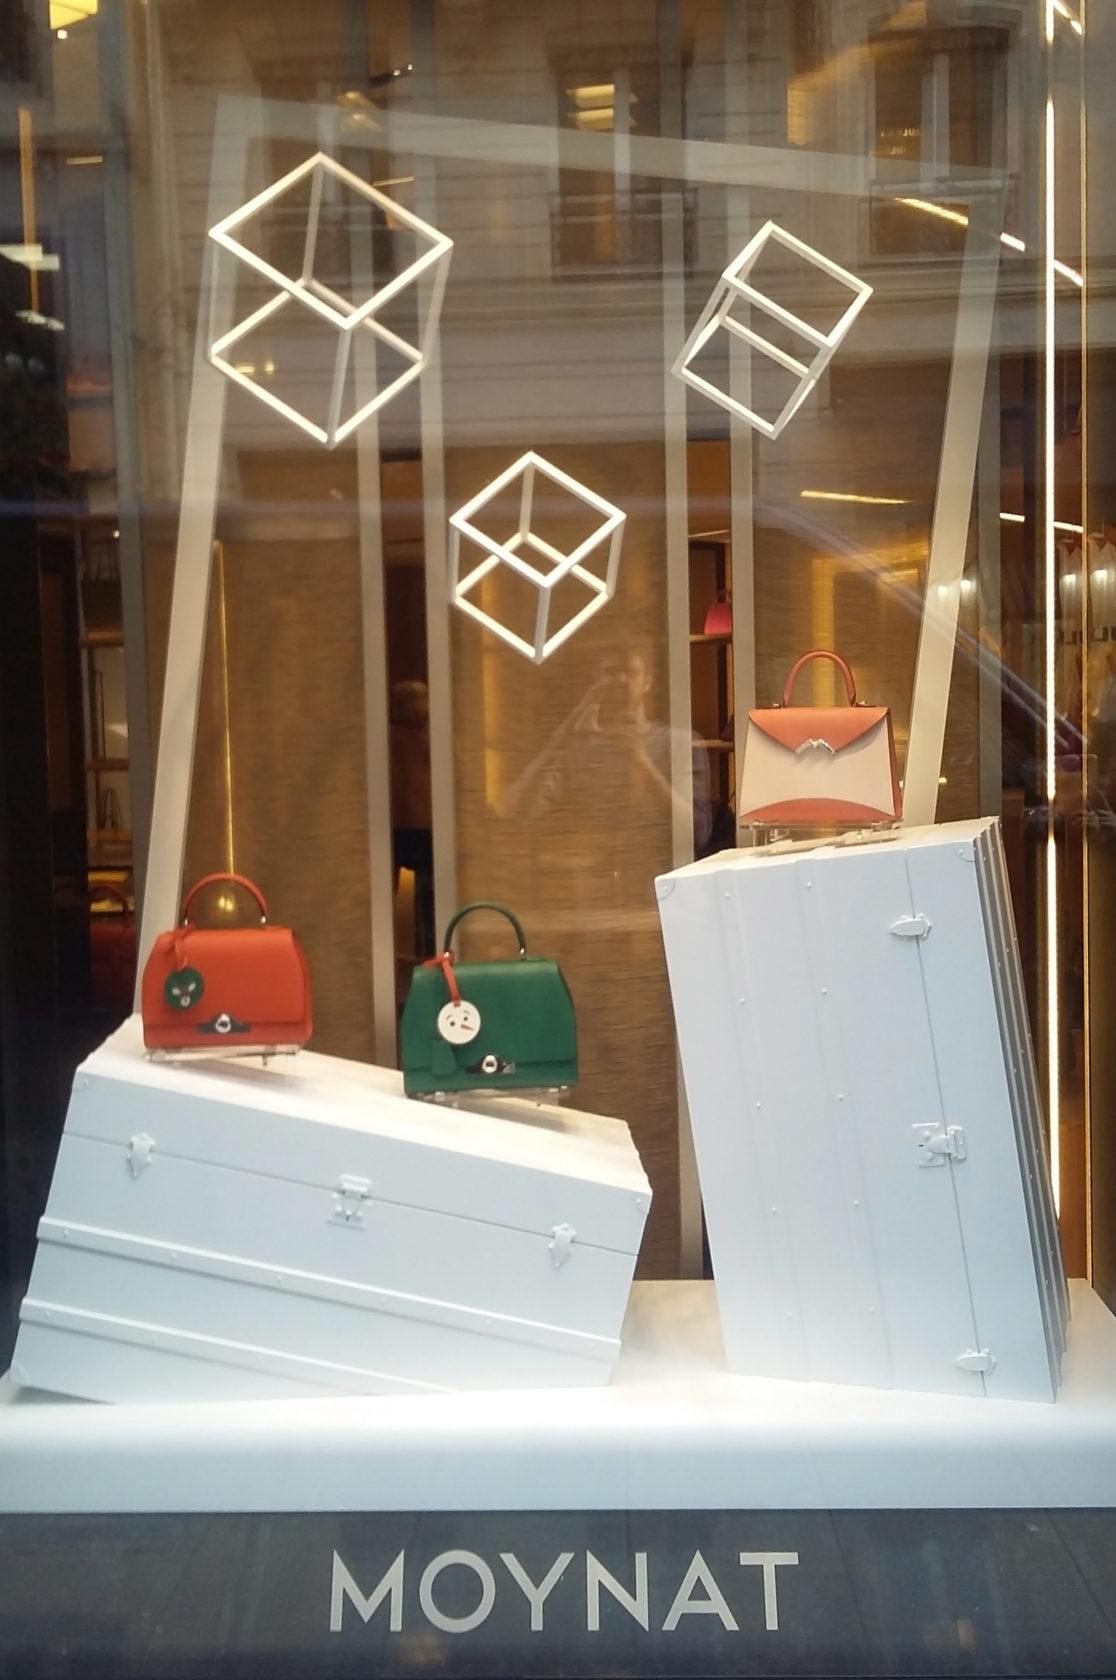 fran ais vitrines moynat ludovic avenel b niste cr ateur. Black Bedroom Furniture Sets. Home Design Ideas